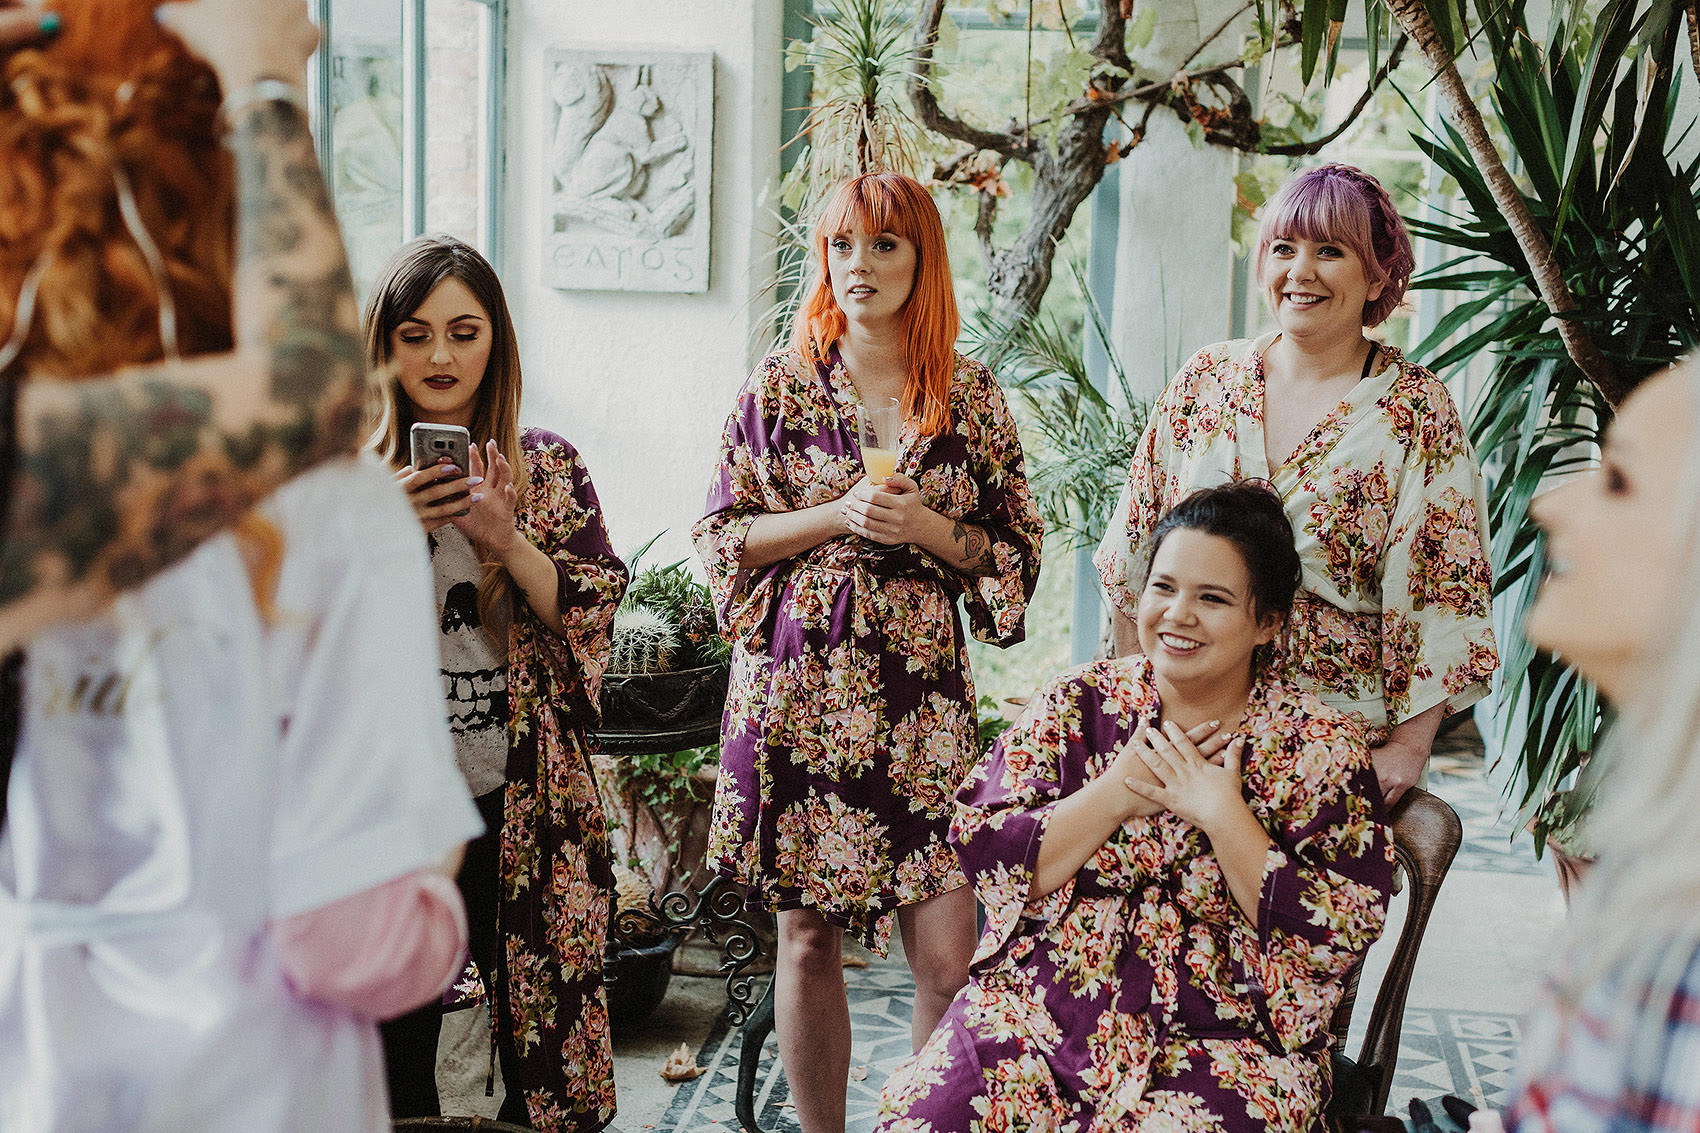 Huntington Castle & Gardens wedding | Ruth & Jason 21